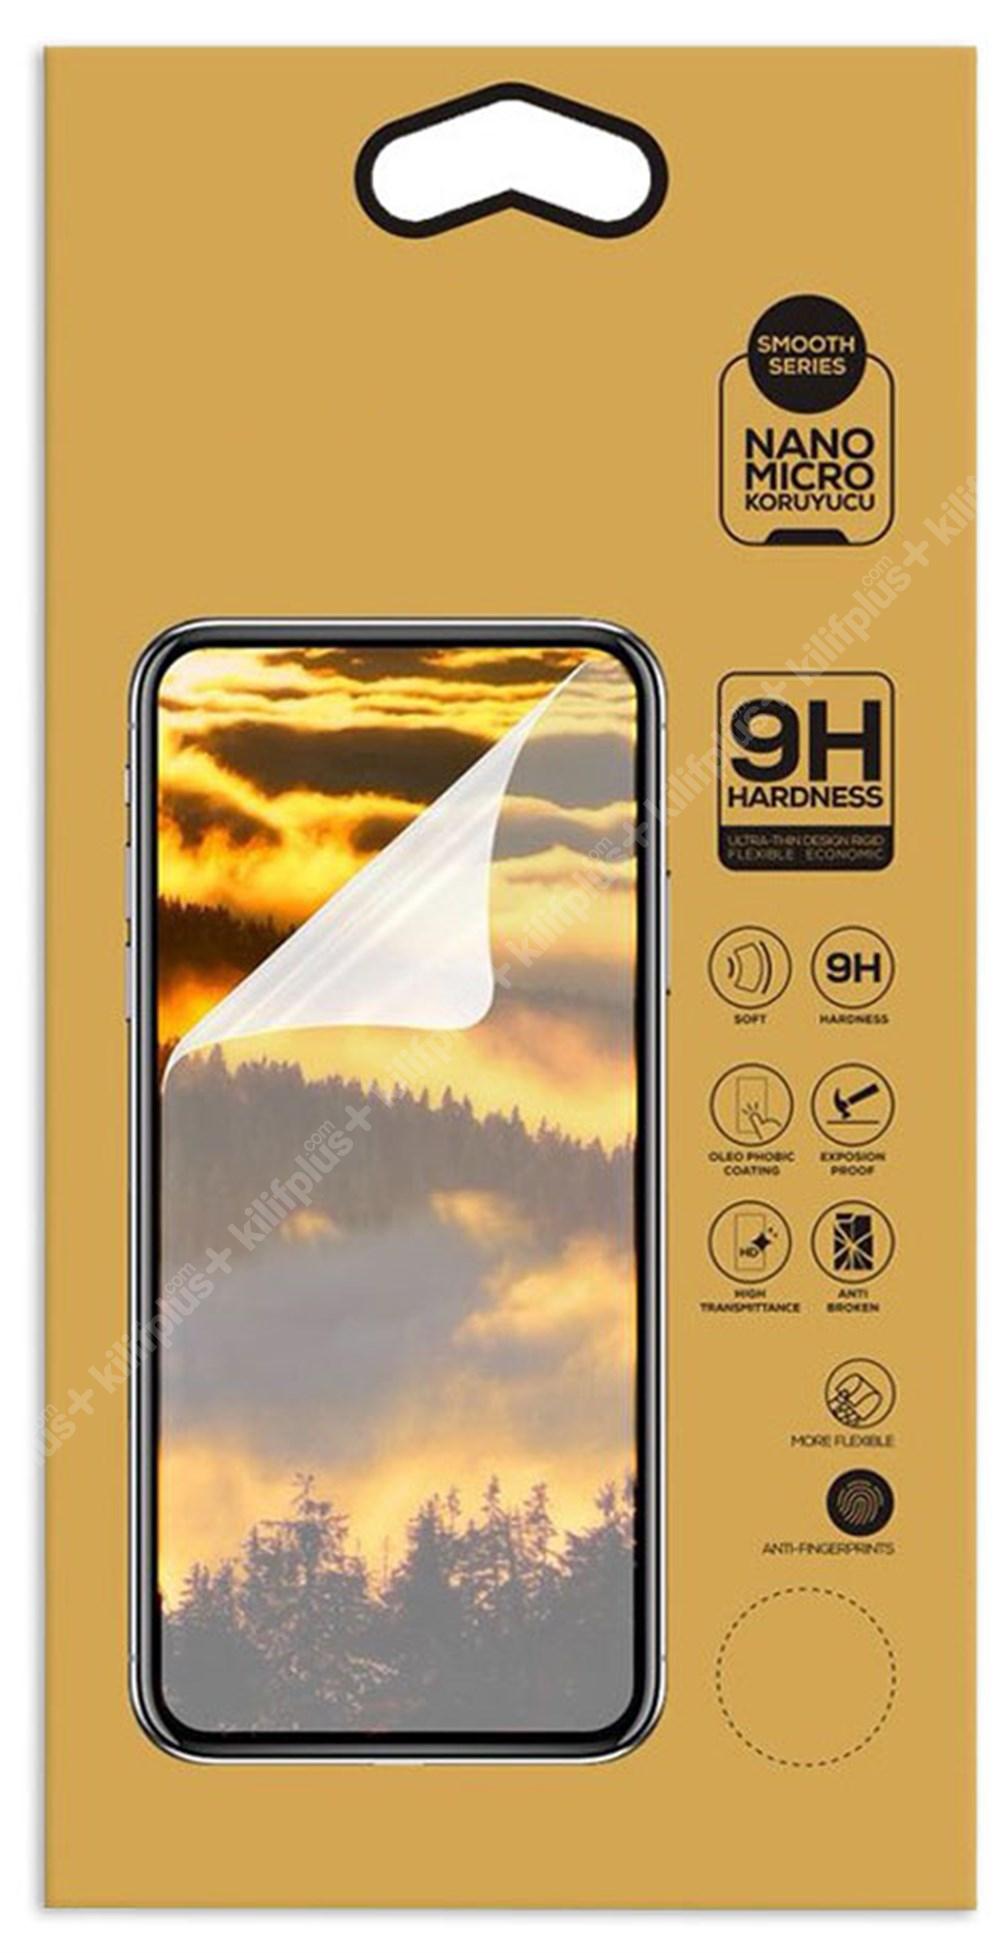 Vivo Y20 Ekran Koruyucu Gold Nano Esnek Film Kırılmaz - Şeffaf